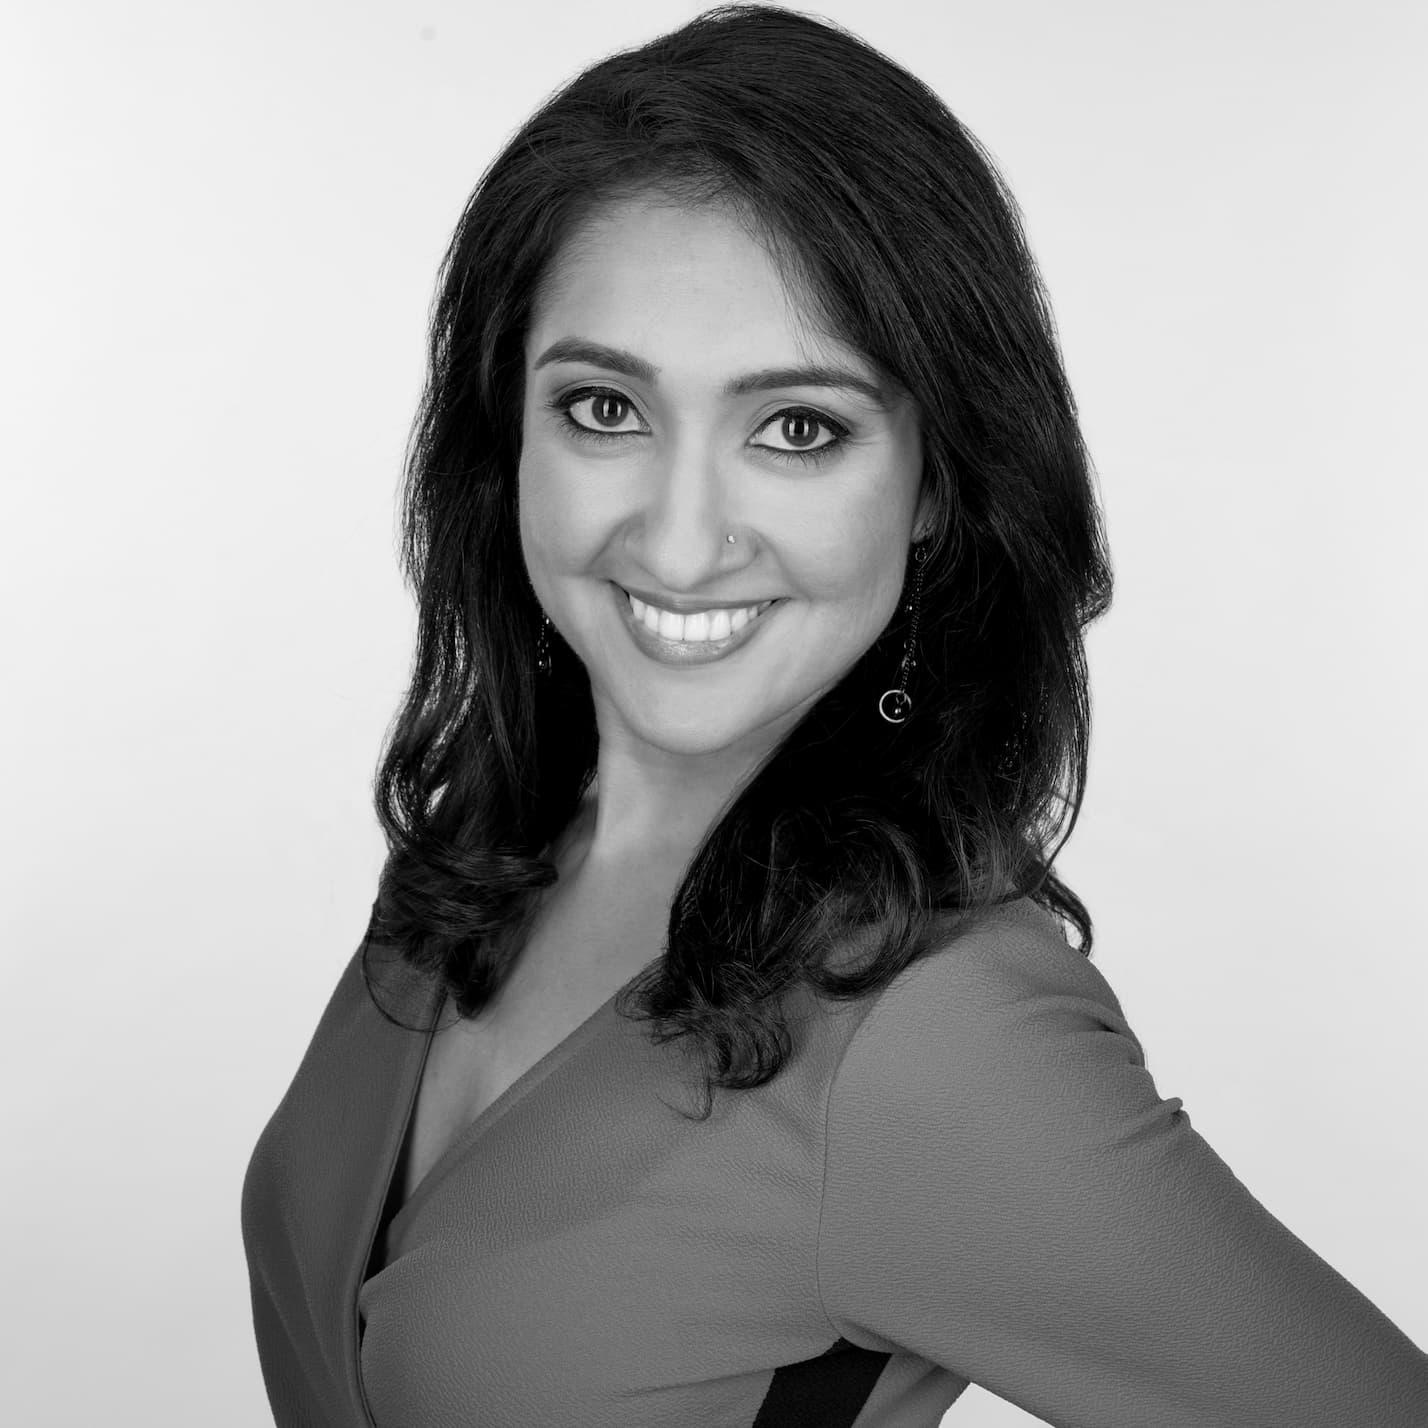 Anjalee Khemlani